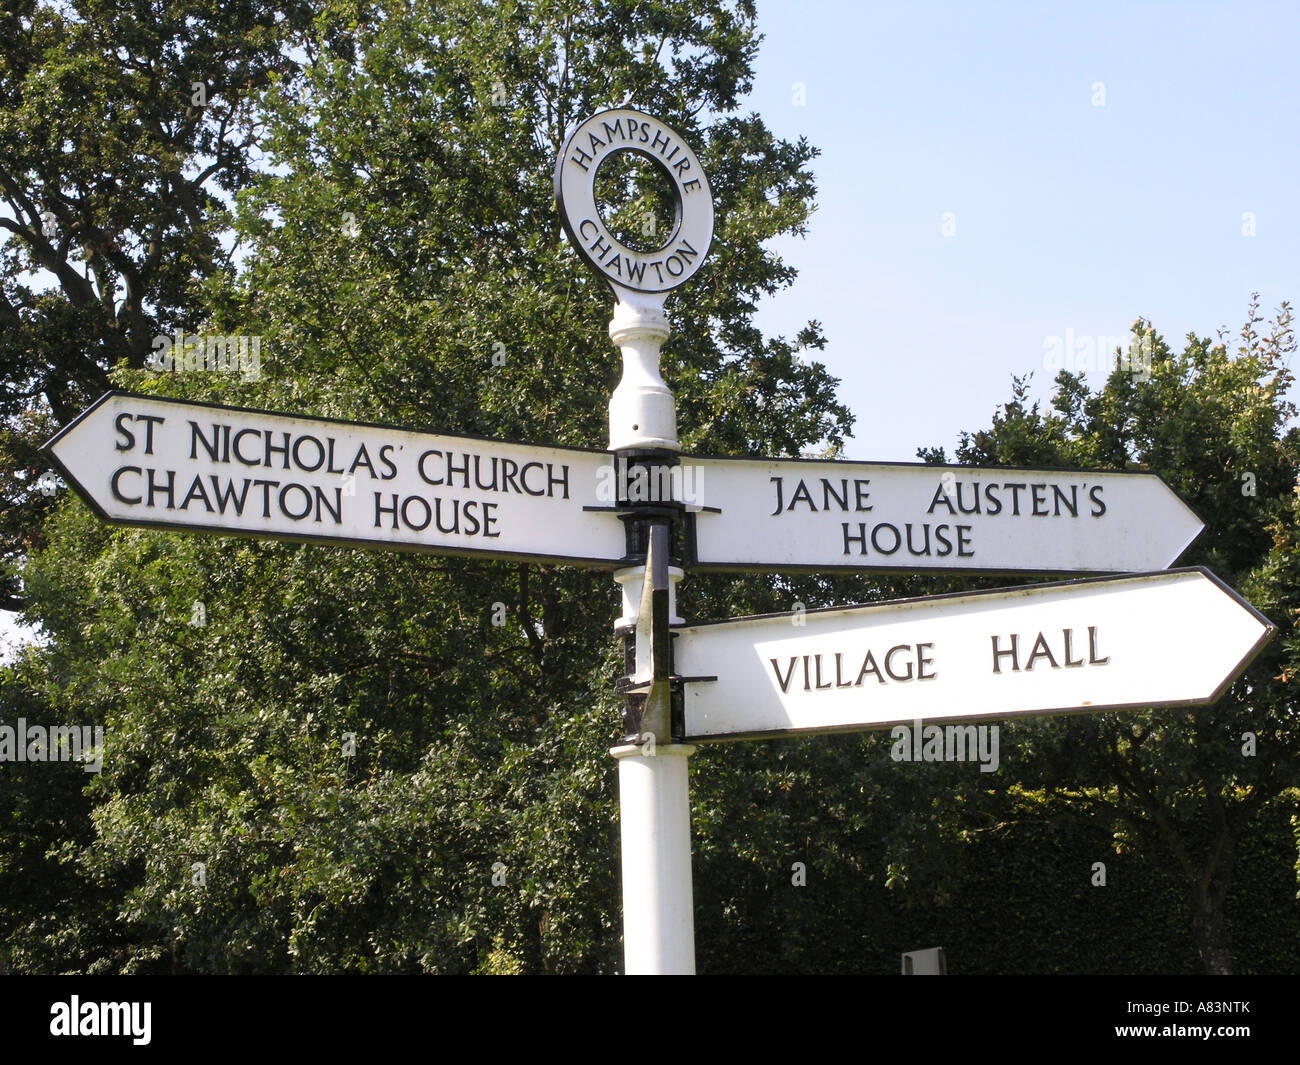 Hampshire chawton village signpost jane austens casa salón Village y la iglesia de Inglaterra gb Imagen De Stock